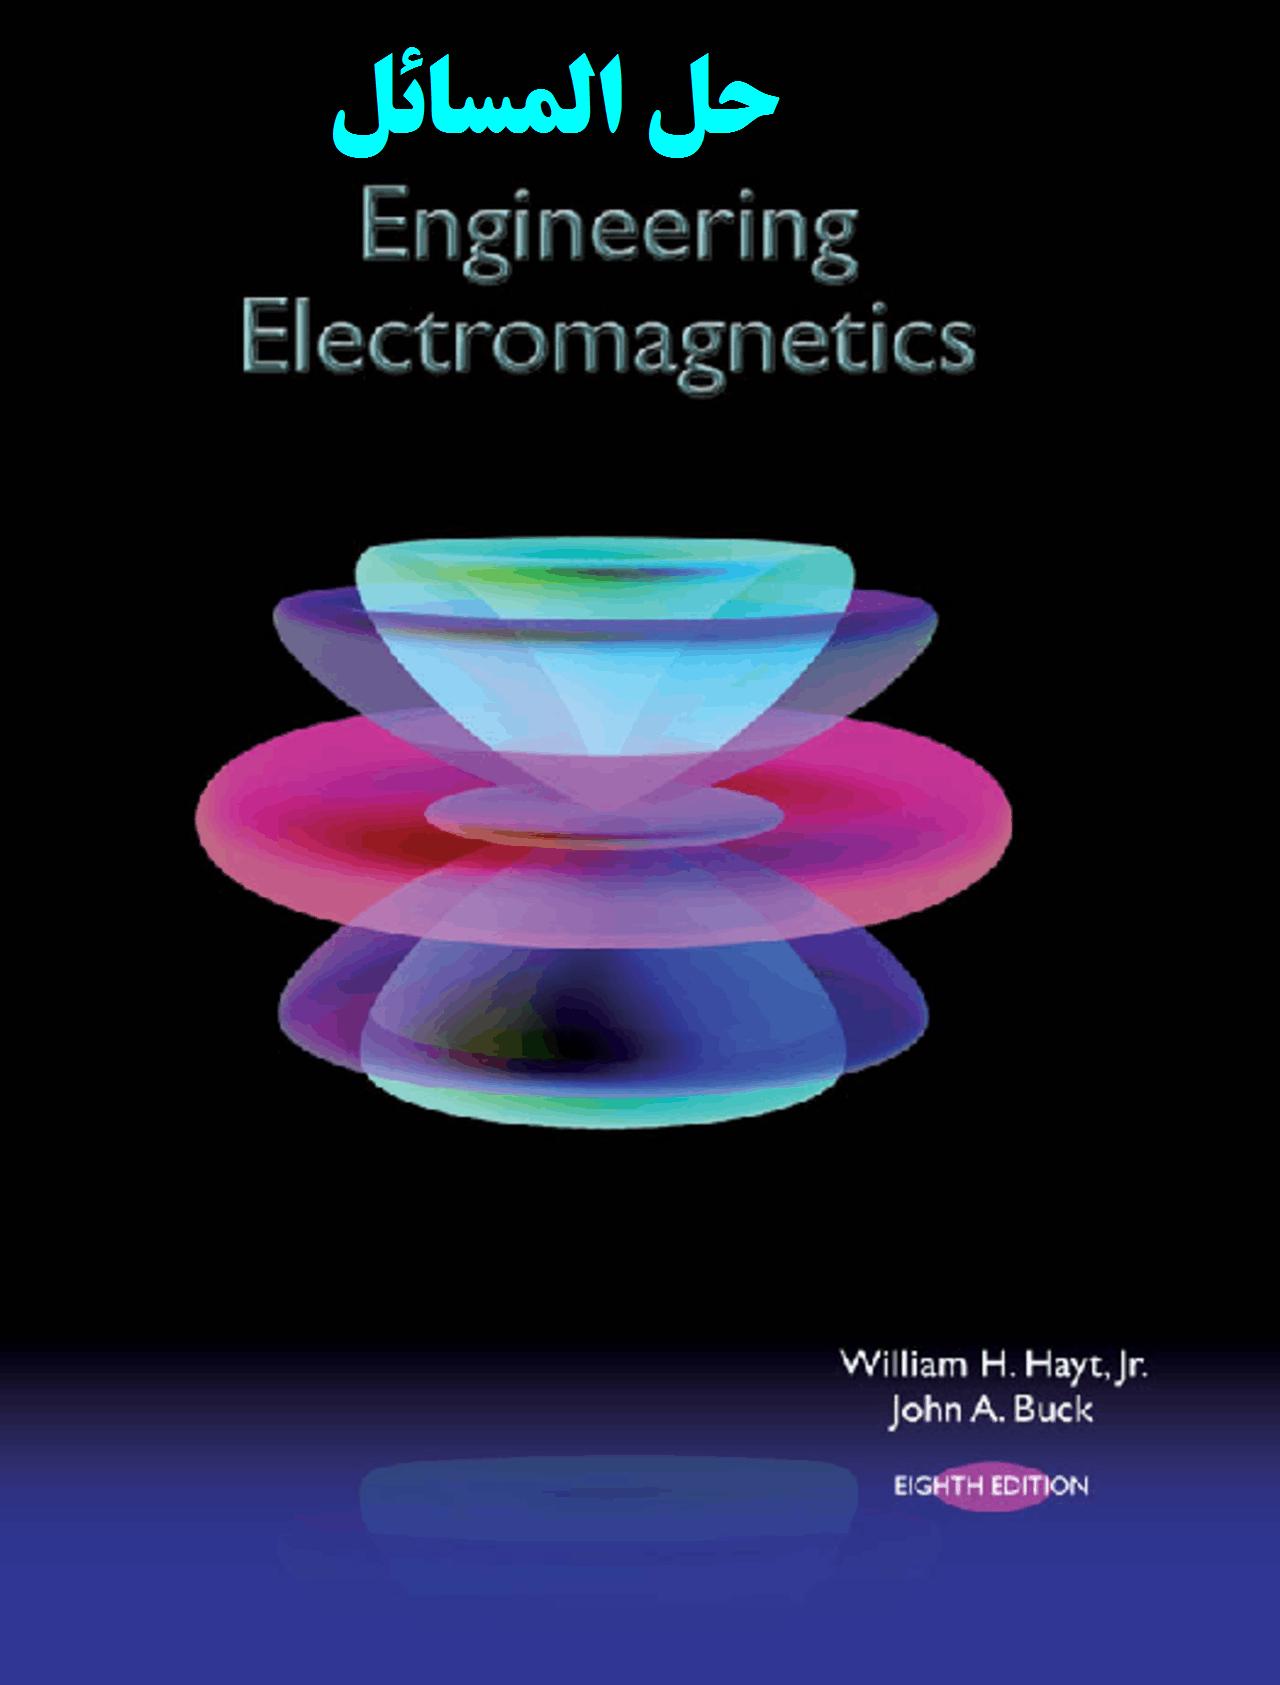 دانلود حل المسائل الکترومغناطیس مهندسی ویلیام هیت ویرایش ۸